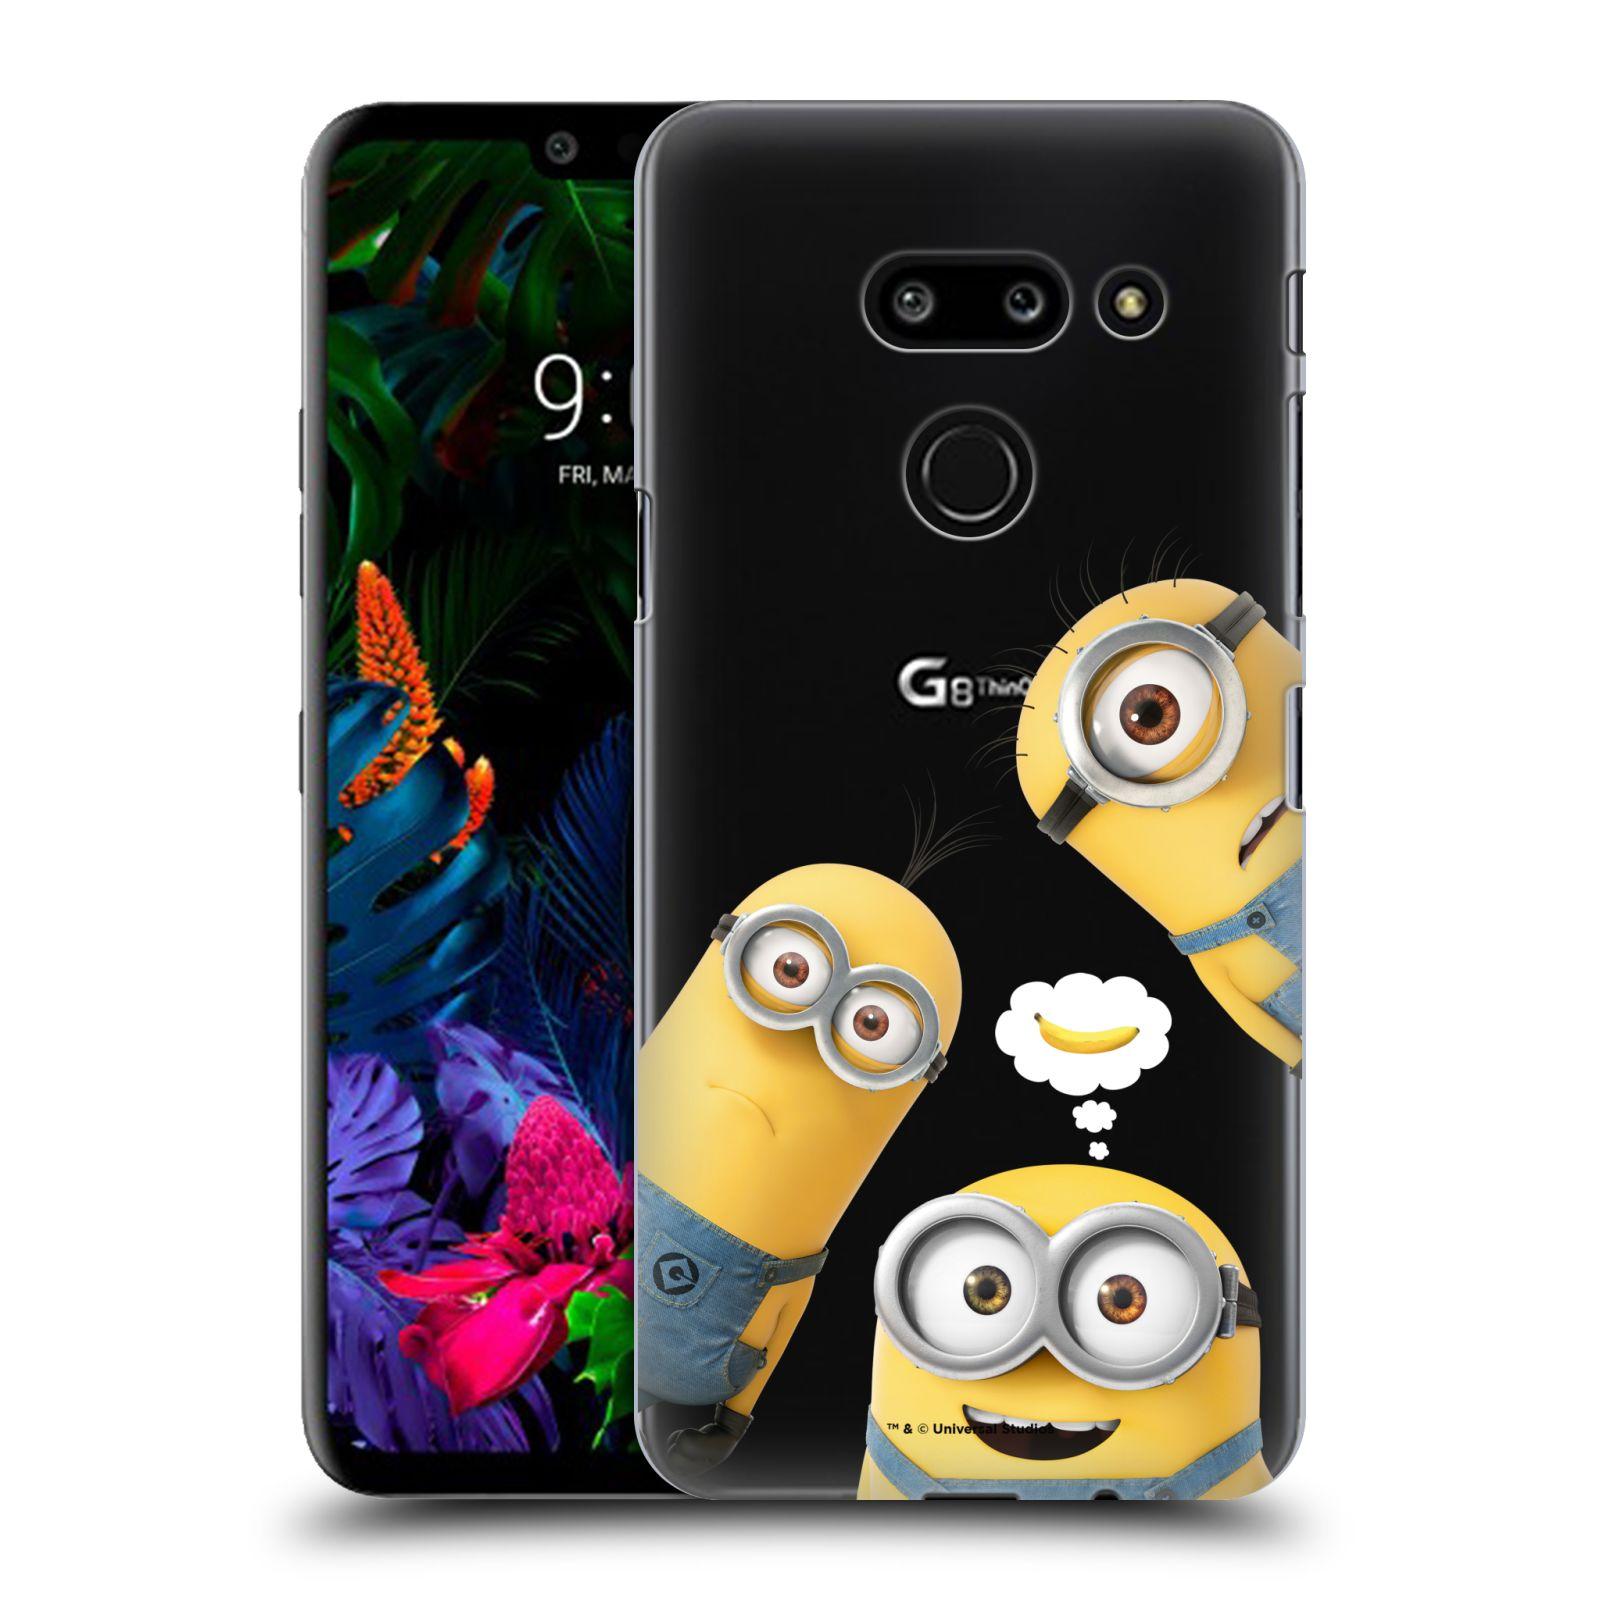 Plastové pouzdro na mobil LG G8 ThinQ - Head Case - Mimoni Banana z filmu Já, padouch - Despicable Me